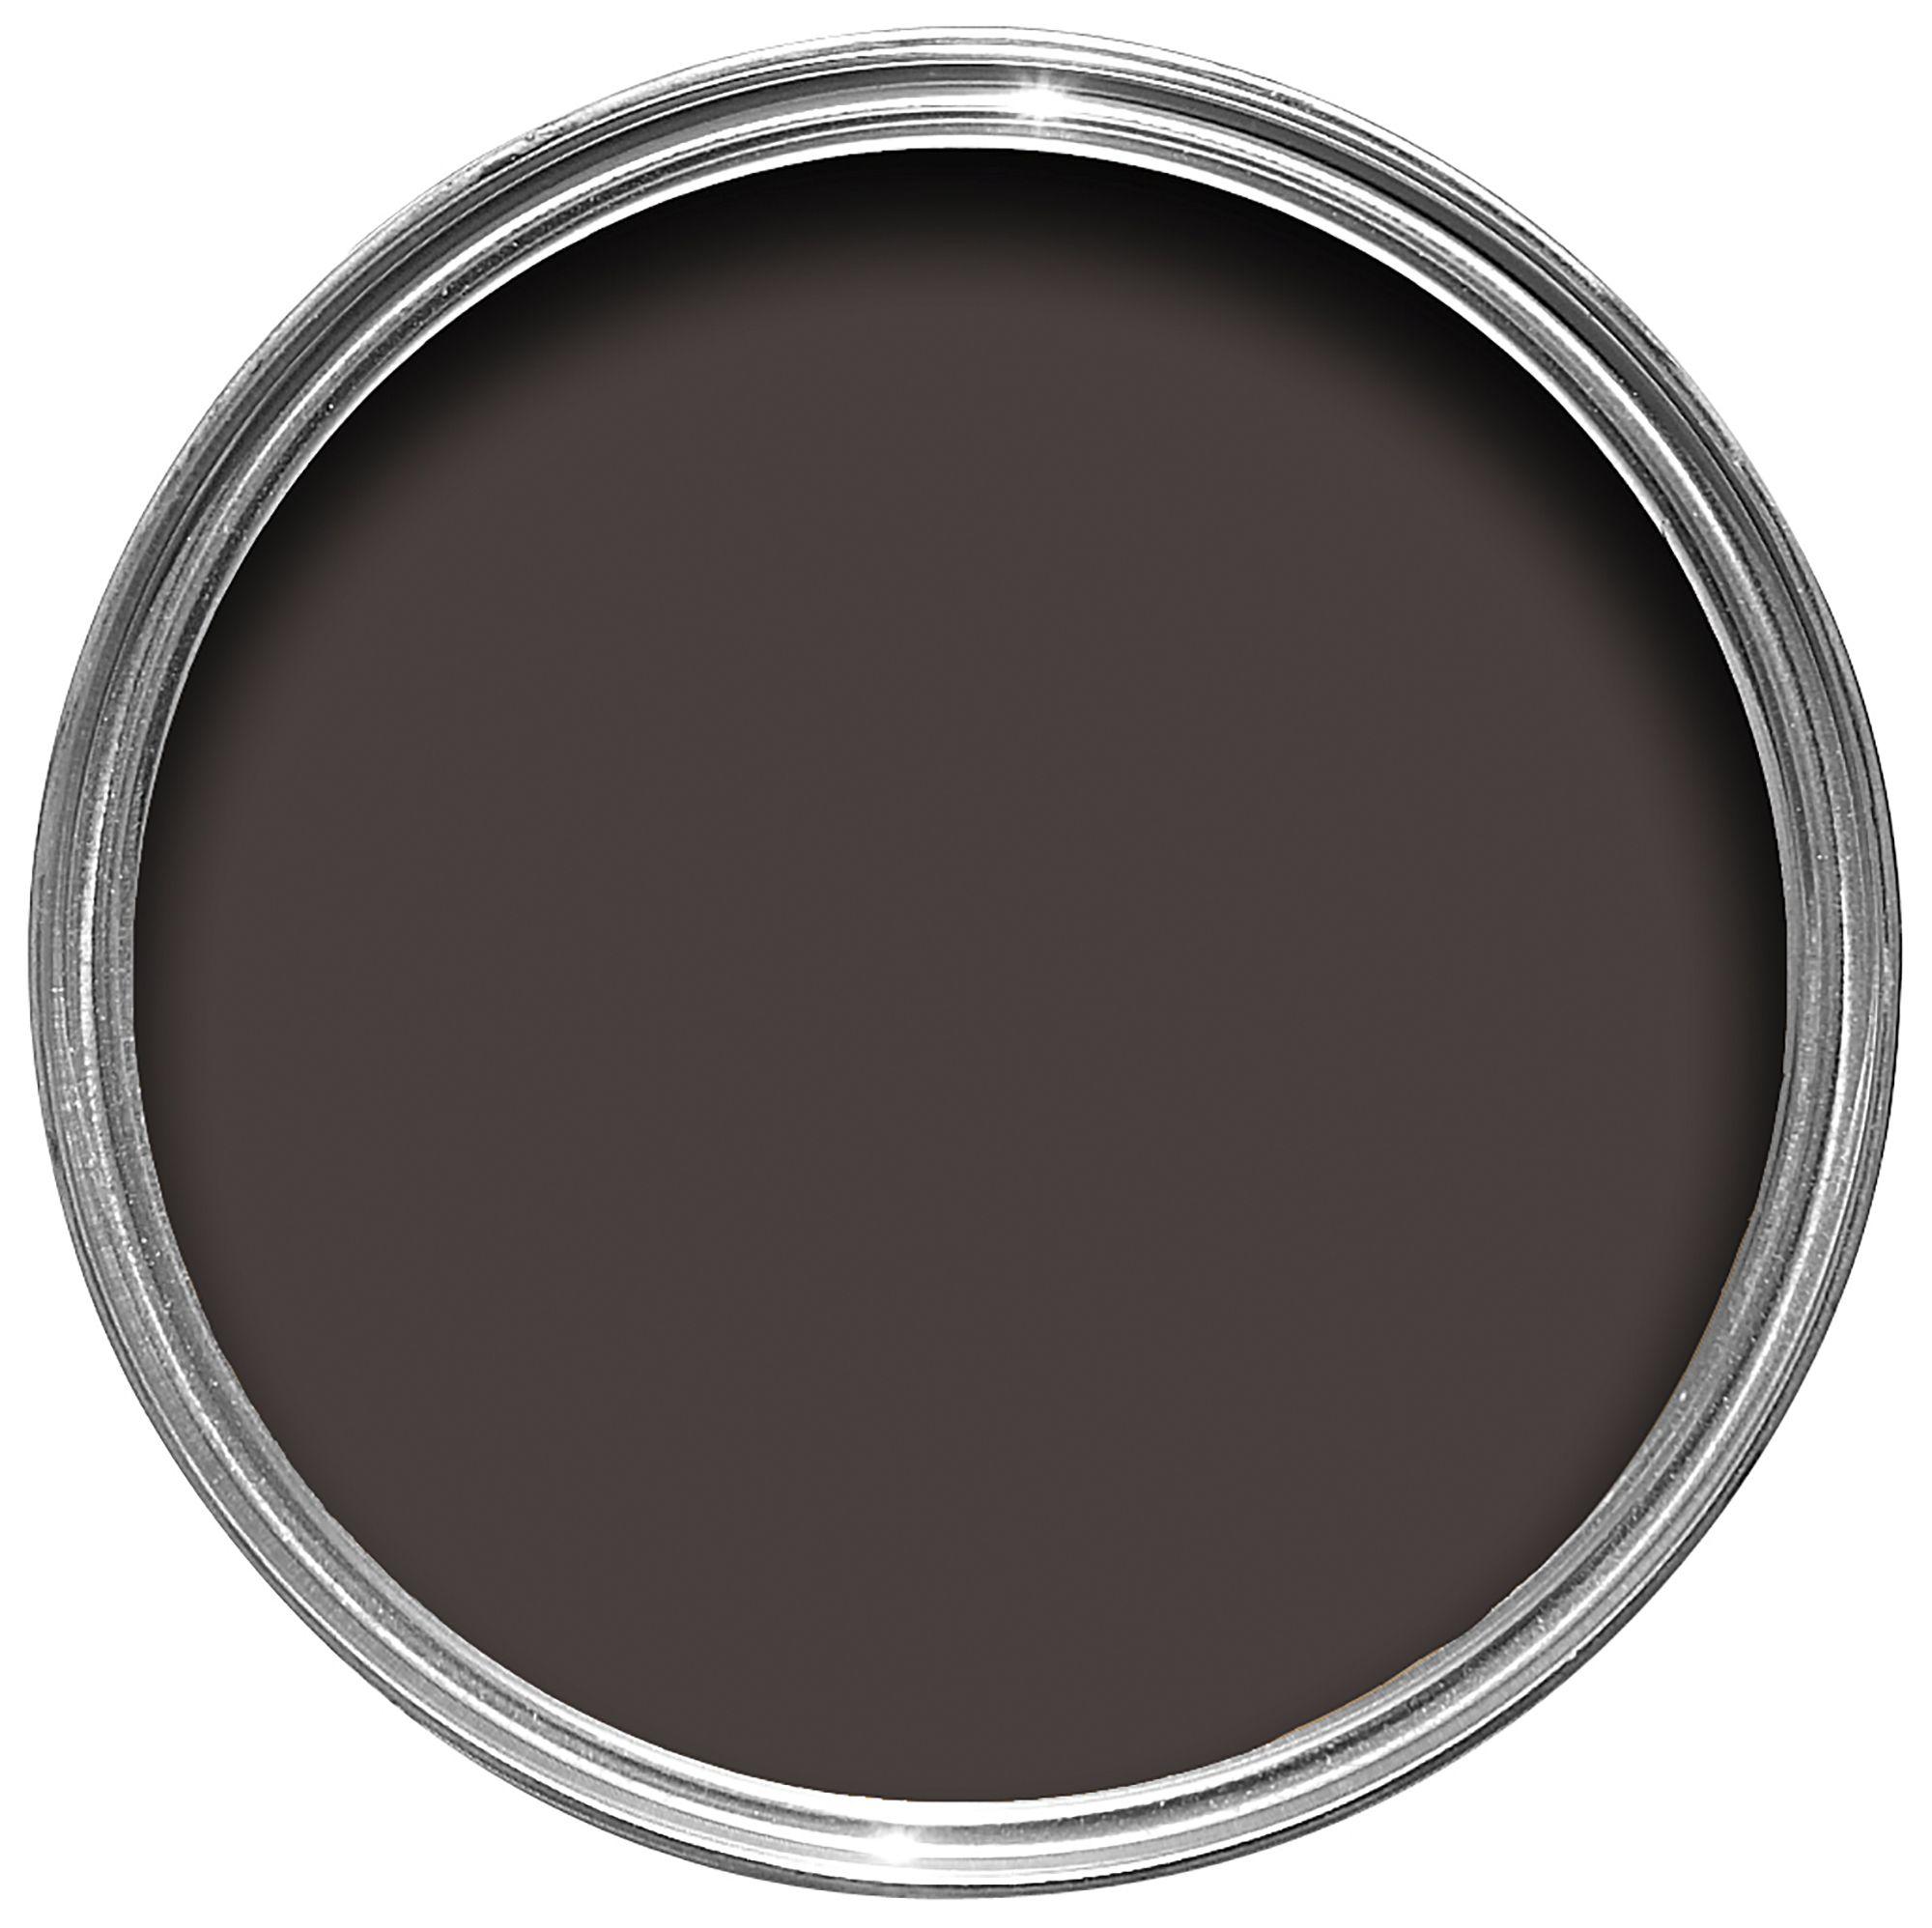 Dark Chocolate Brown Paint Chocolate Paint Diy